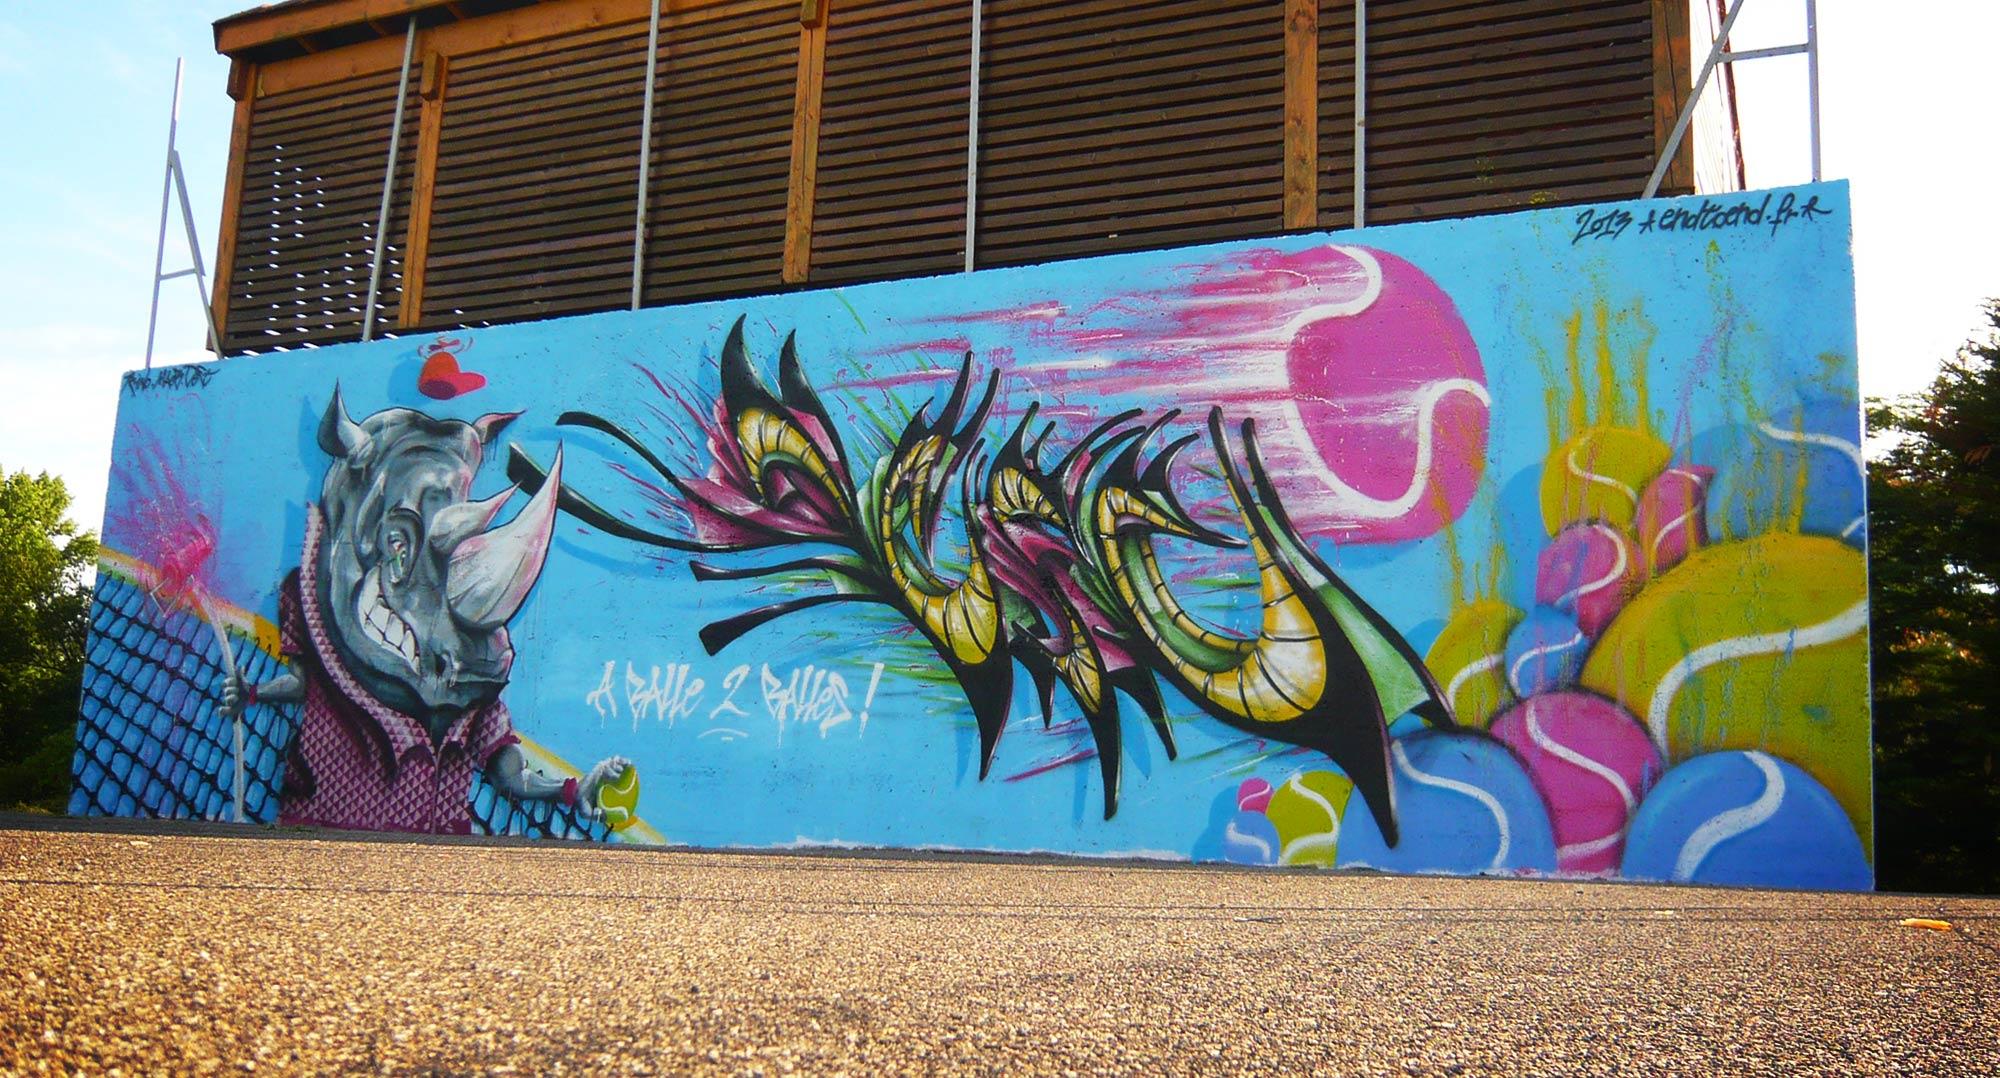 2013_06_15_terrain_tennis_deft_rino_maeb_soleil_2013